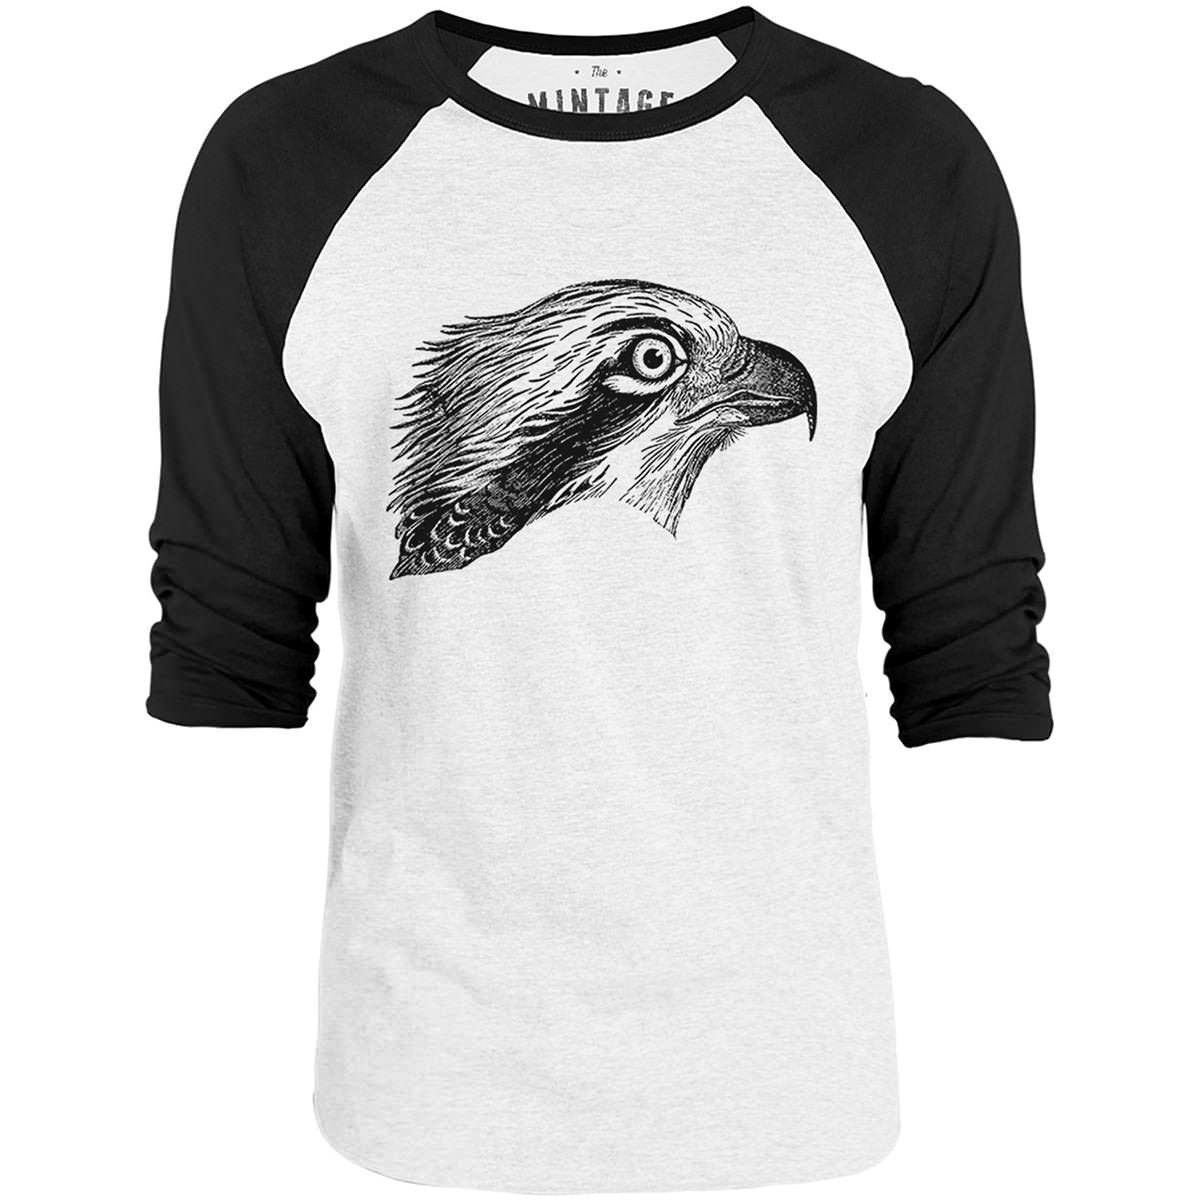 Mintage Hawk Face 3/4-Sleeve Raglan Baseball T-Shirt (White / Black)